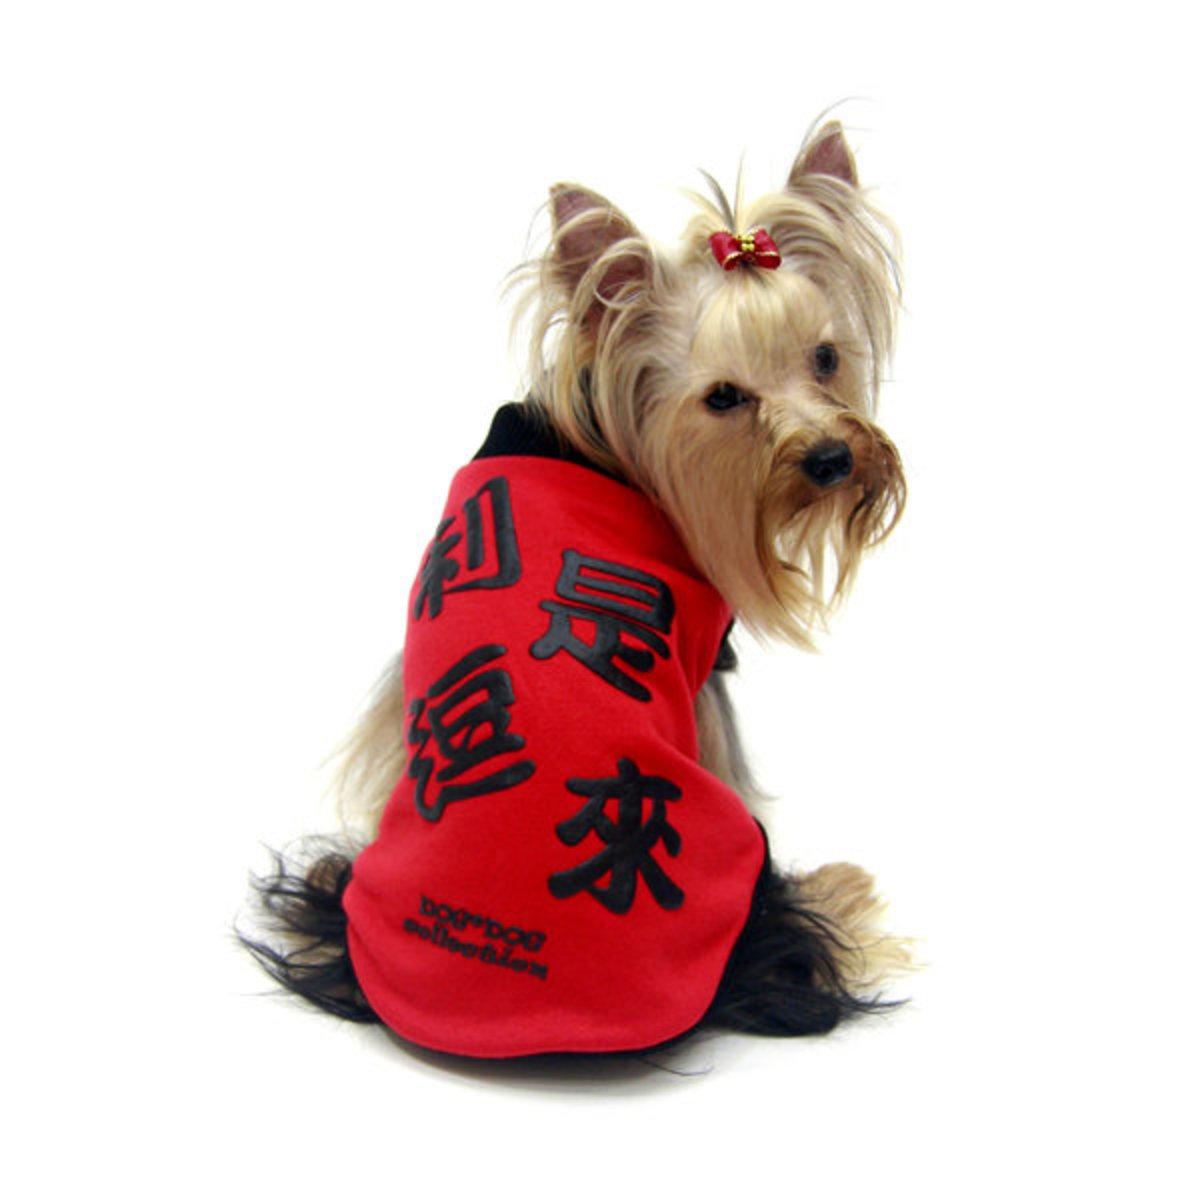 Reversible T-shirt Dog Clothes